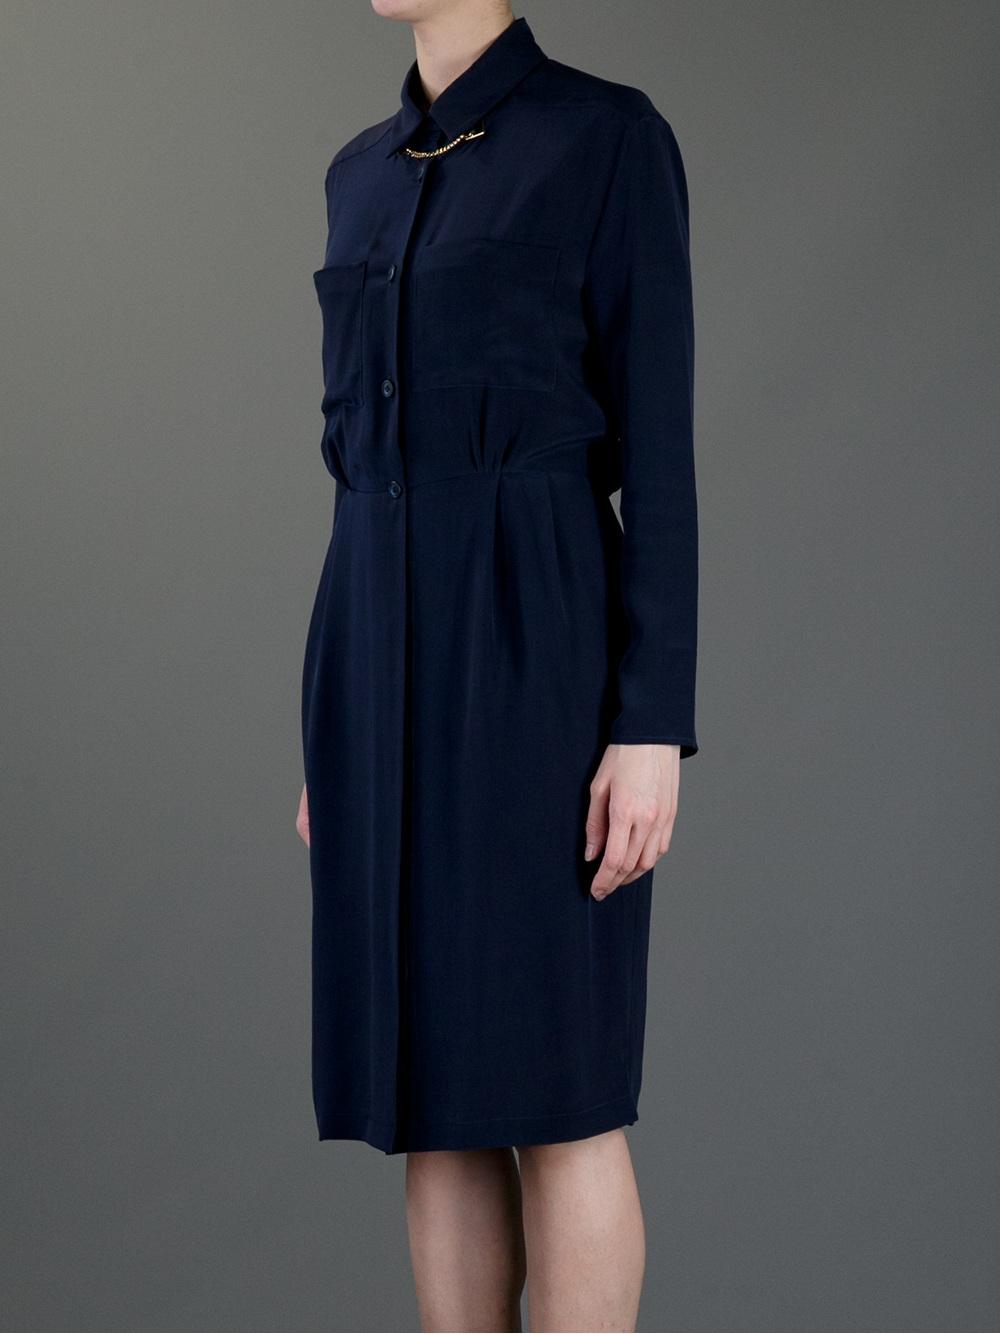 Lyst Sophie Hulme Silk Shirt Dress In Blue